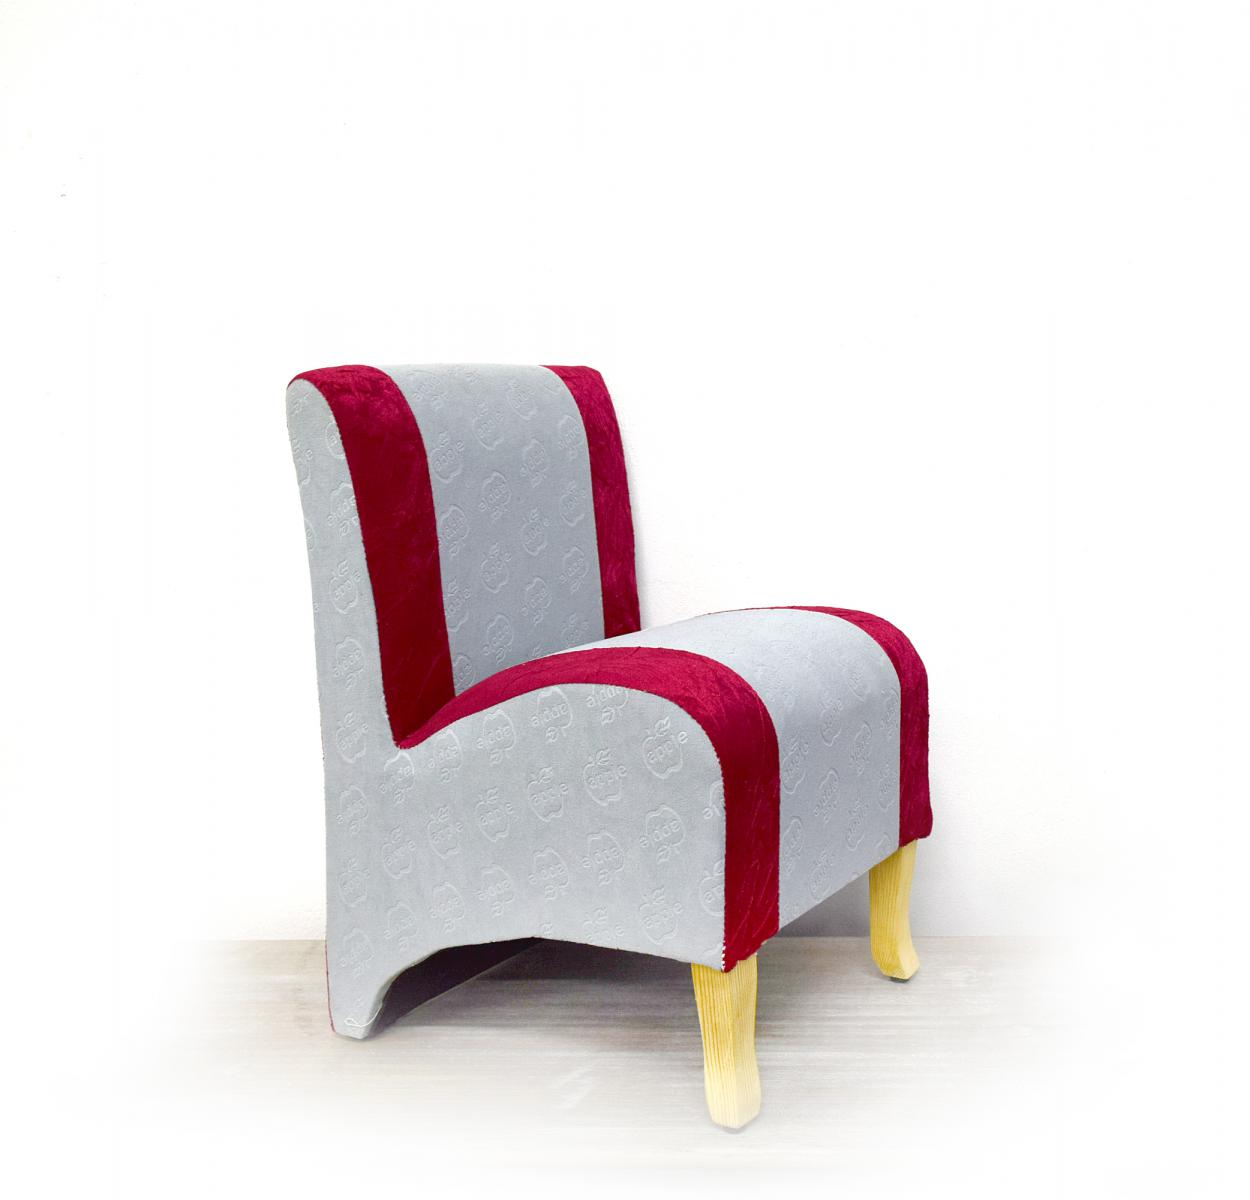 MINI P Small Chair Sofa Stool Cushions 17 Colours Hallway